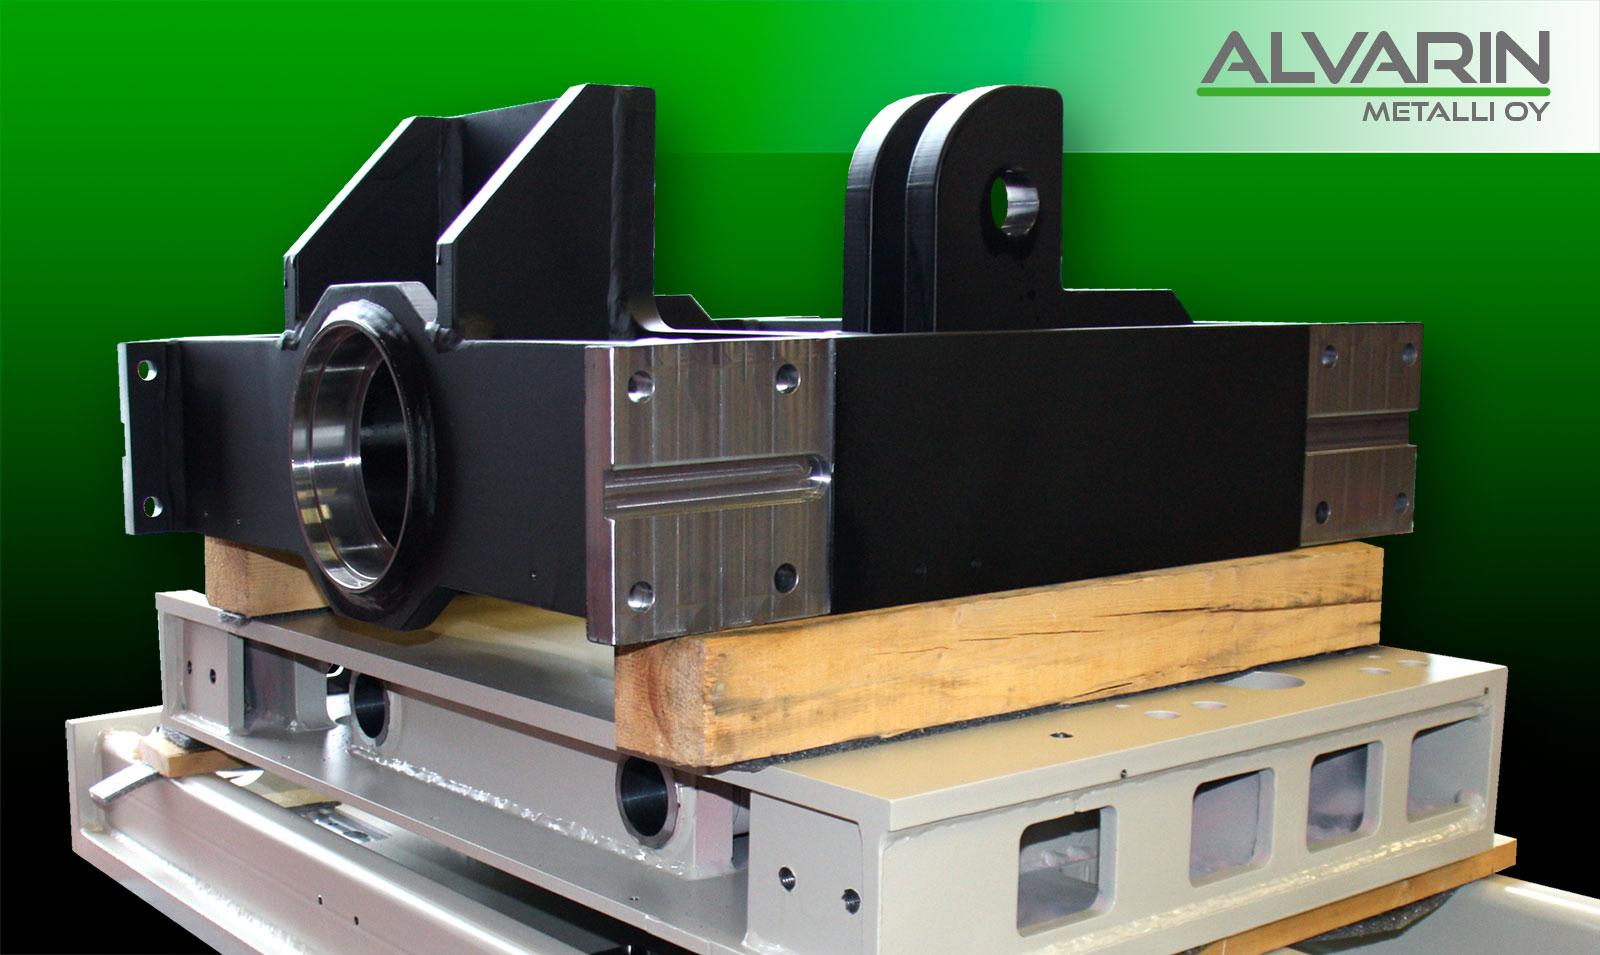 Alvarin_Metalli_alihankinta-konepaja-metalliteollisuus-referenssit_kappale_25